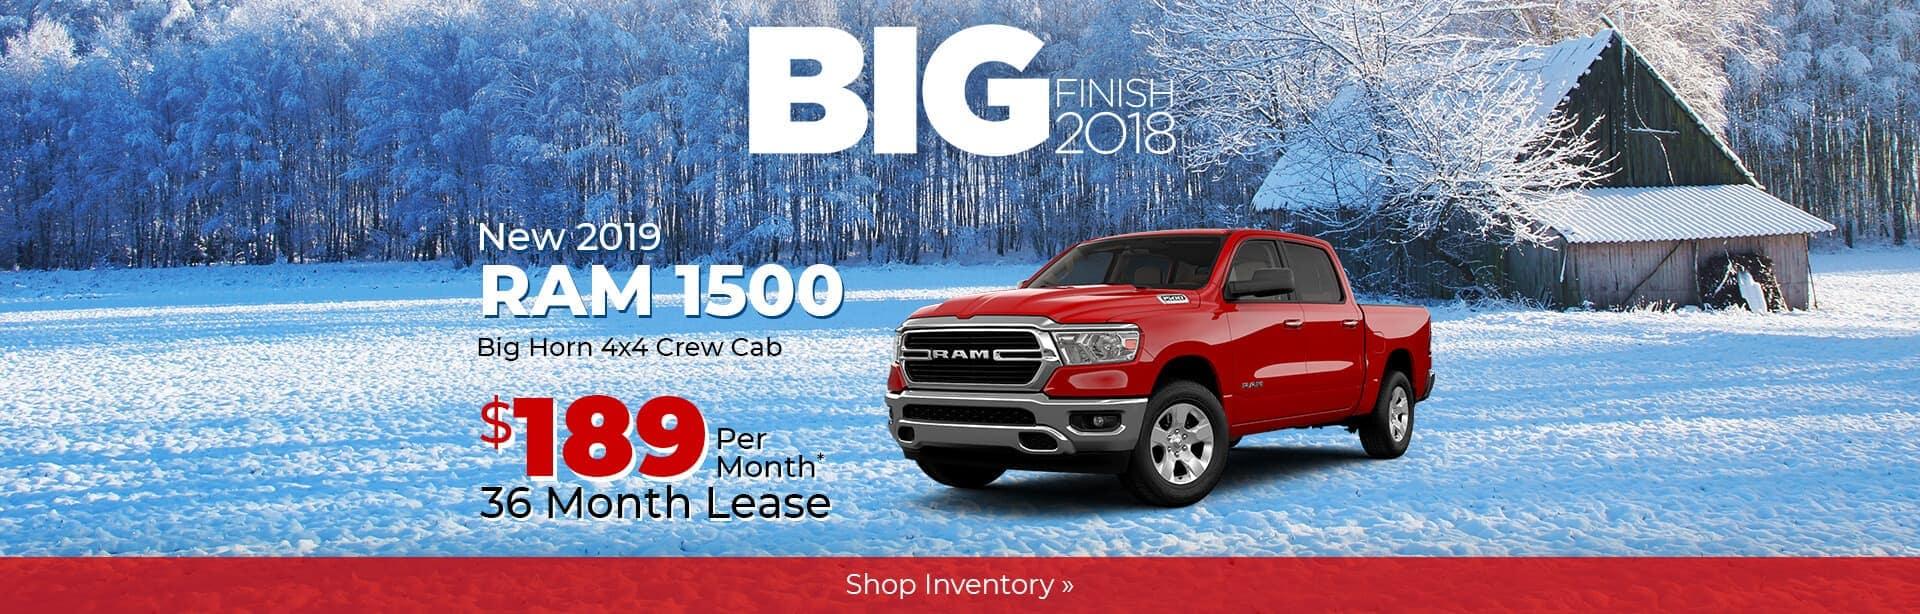 2019 Ram 1500 Big Horn Big Finish Lease Special near Lafayette, Indiana.